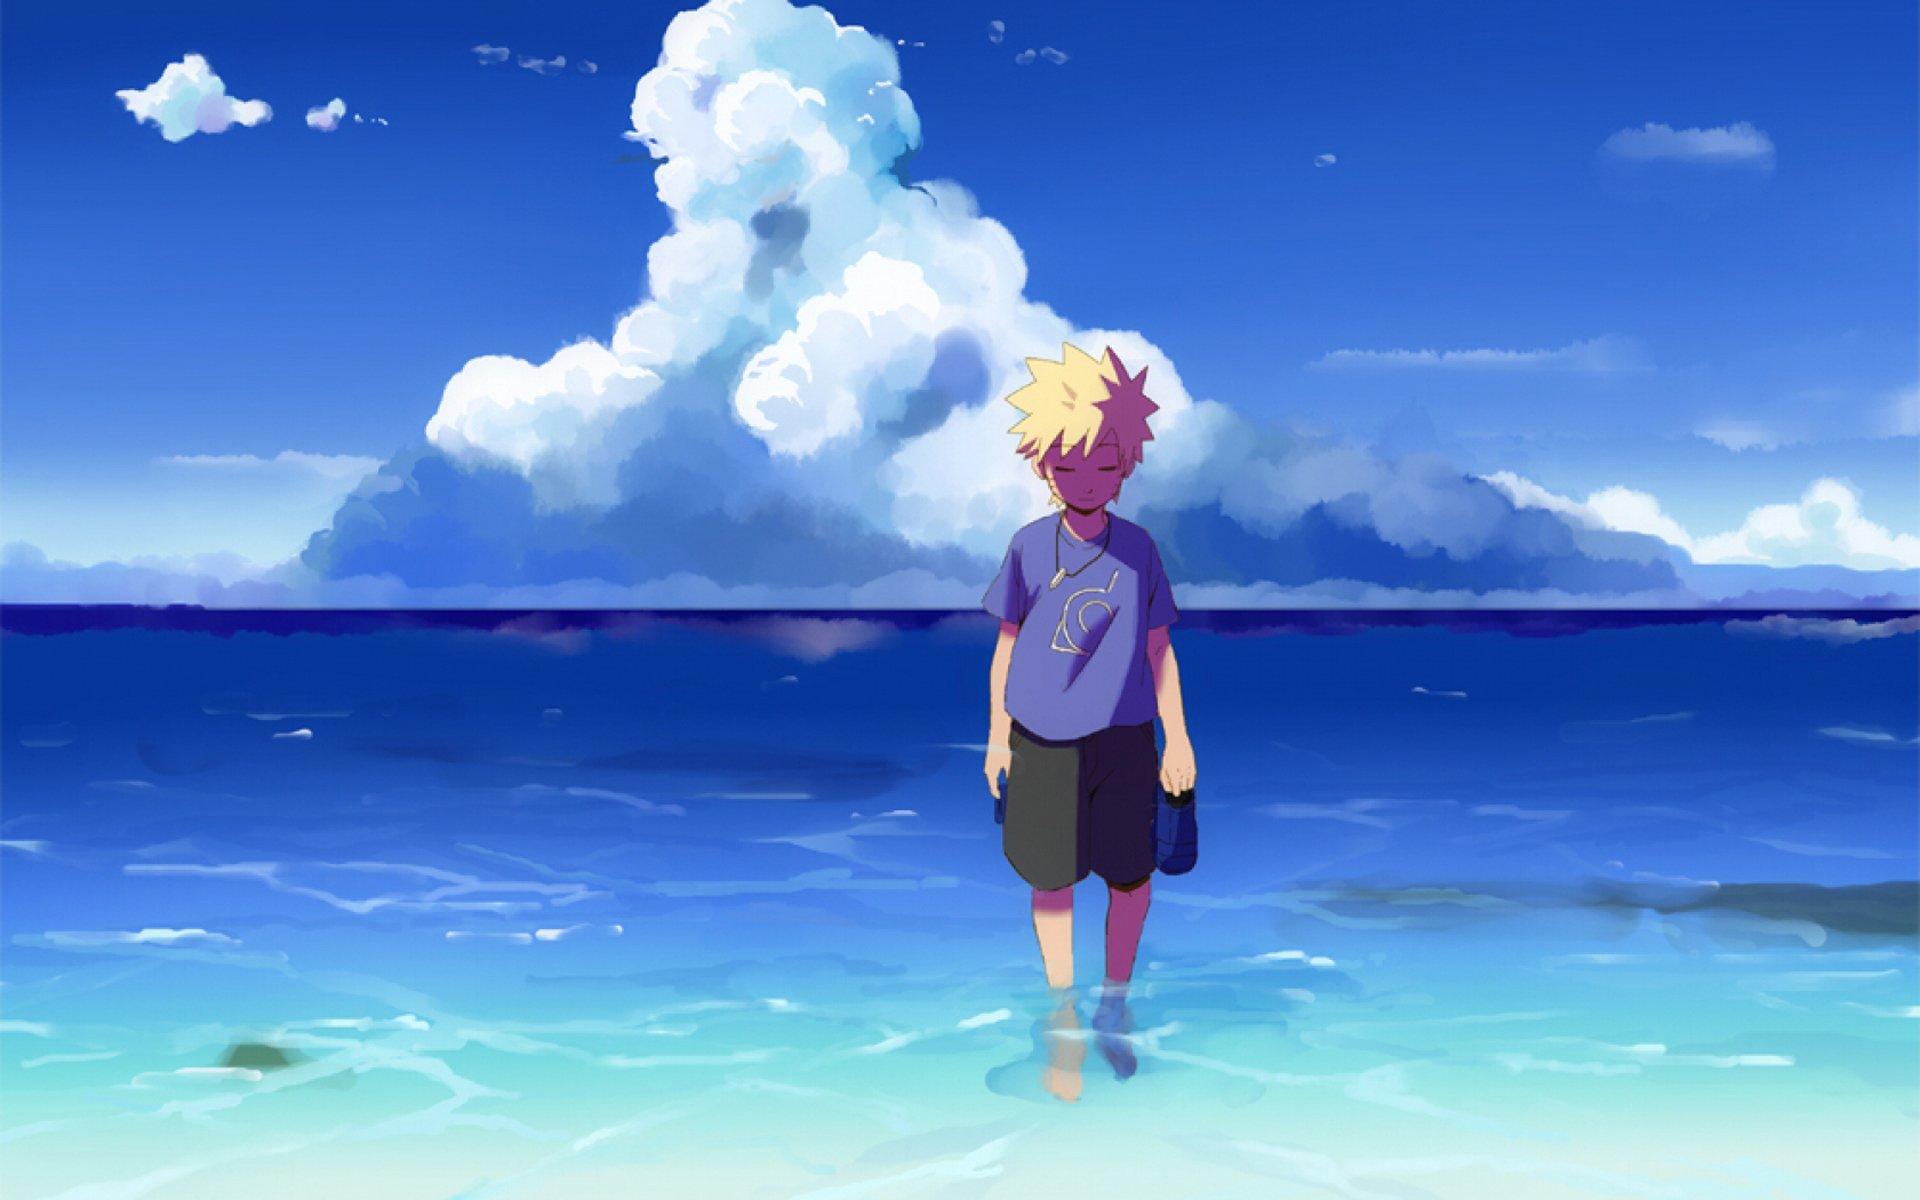 Anime Solitario Dark Sky Blue Mar Oceano Water Naruto Shippuden Boy Kid Triste Short Hair Wallpaper